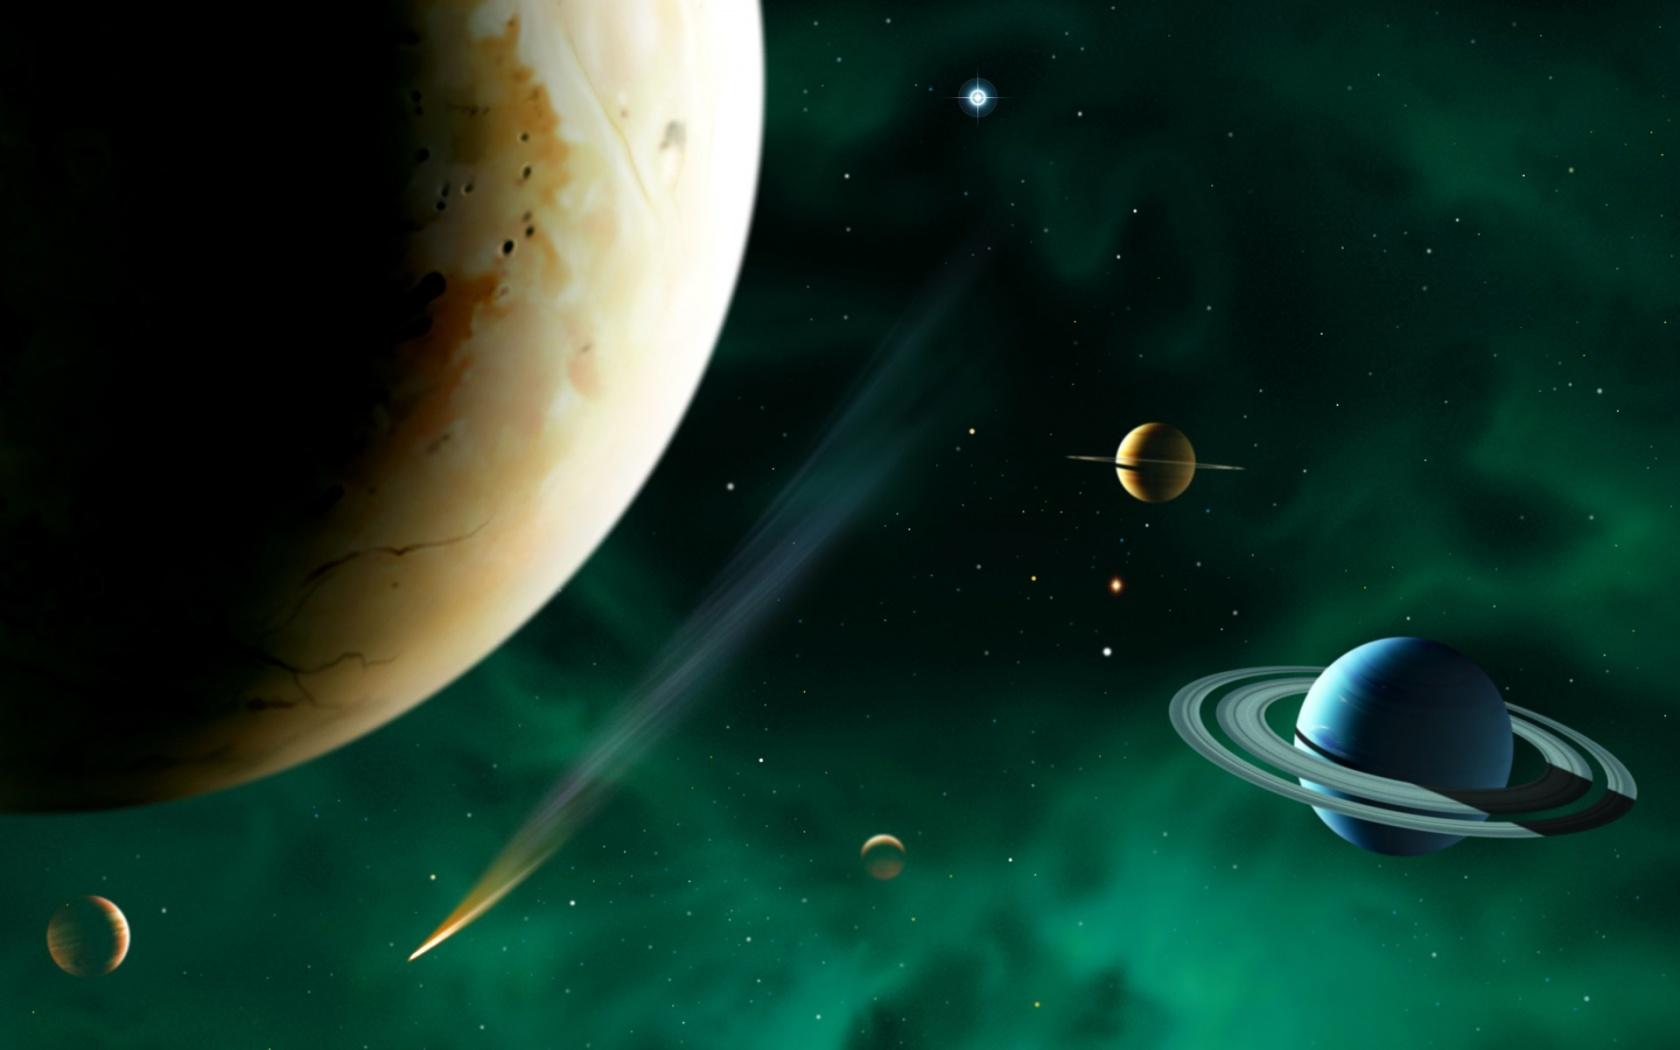 space exploration satellites - photo #4